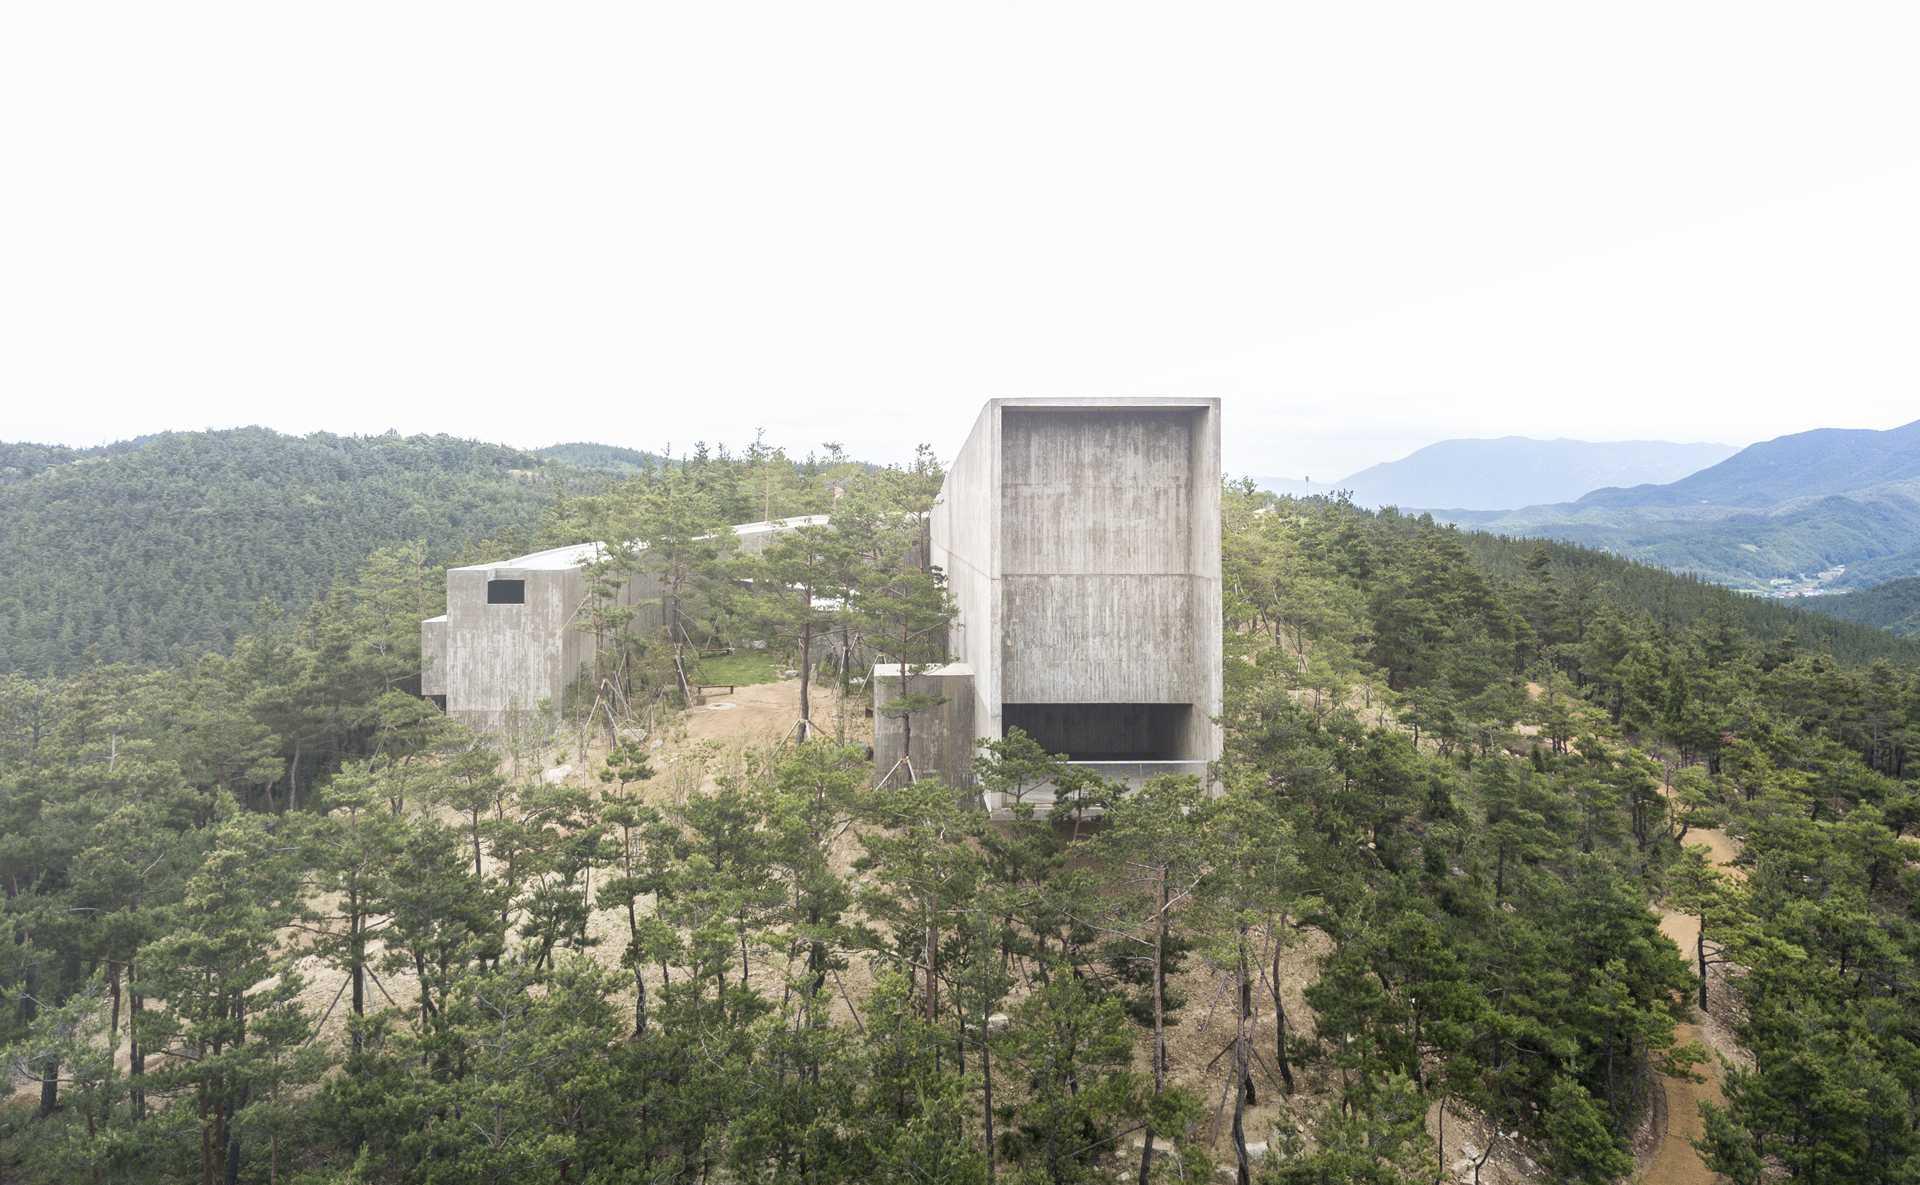 Art Pavilion in Saya Park  - 30 1 30